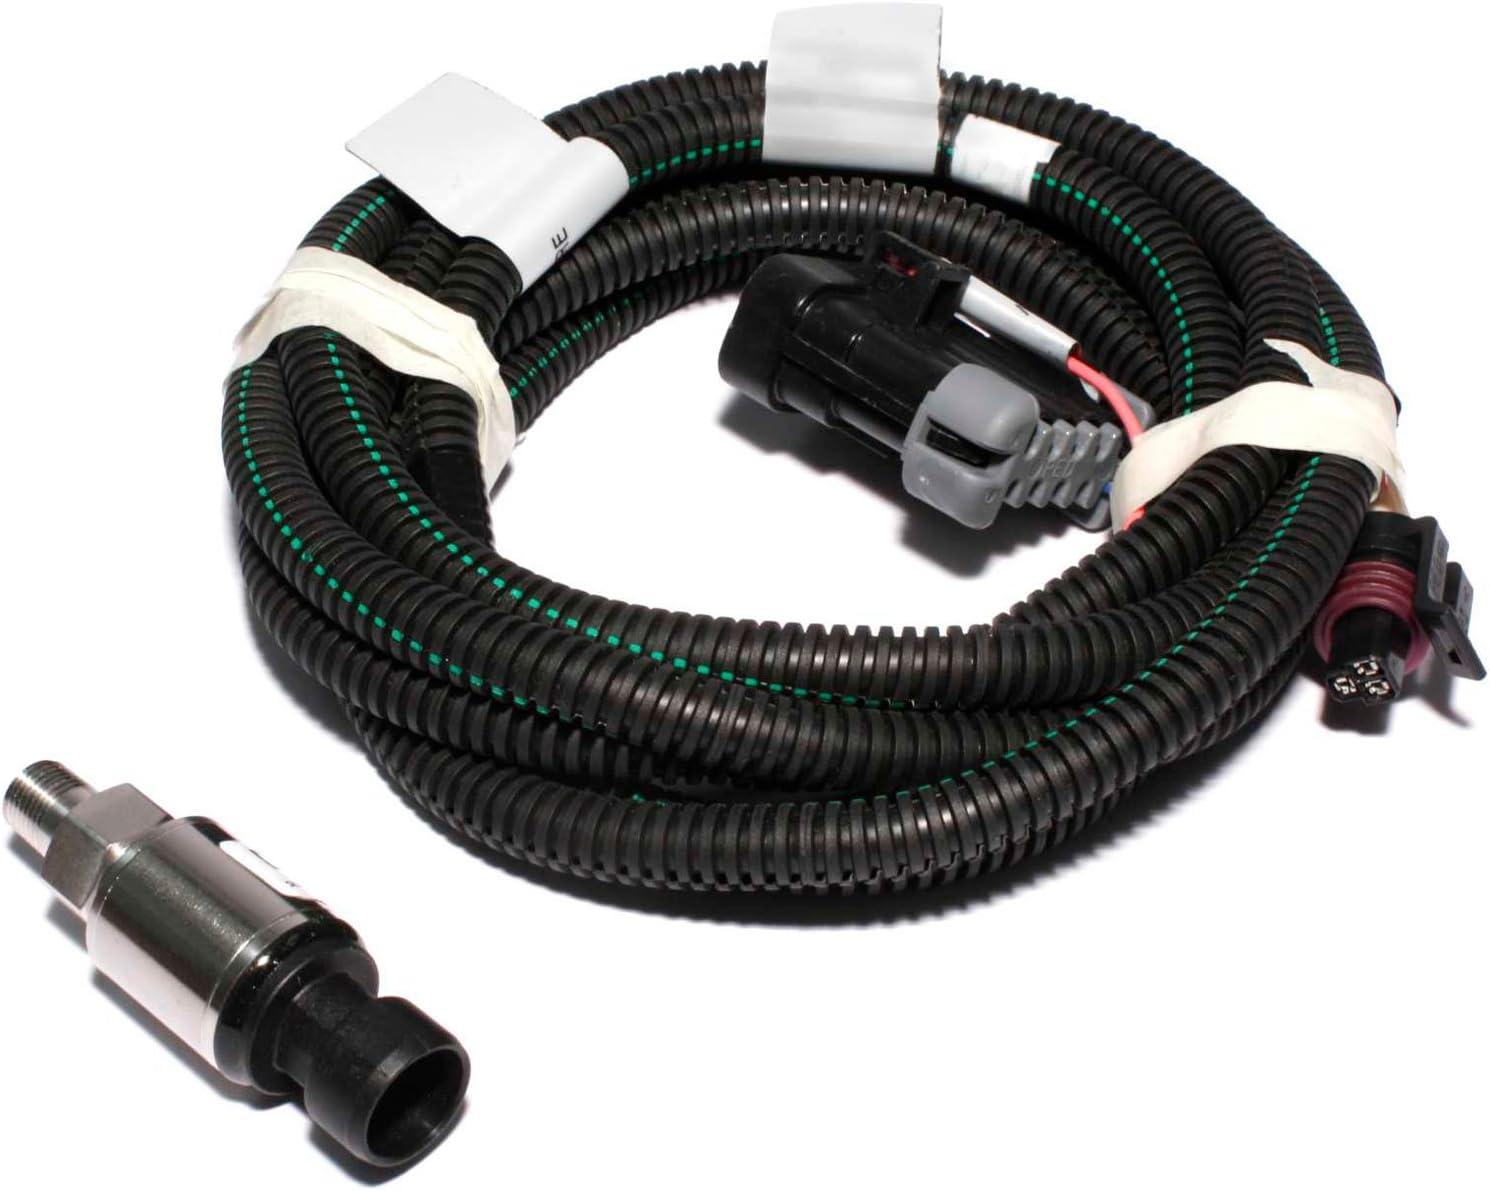 5 ☆ popular Max 67% OFF FAST 301408 Single Precision 0-100 Kit Sensor Harness and PSI